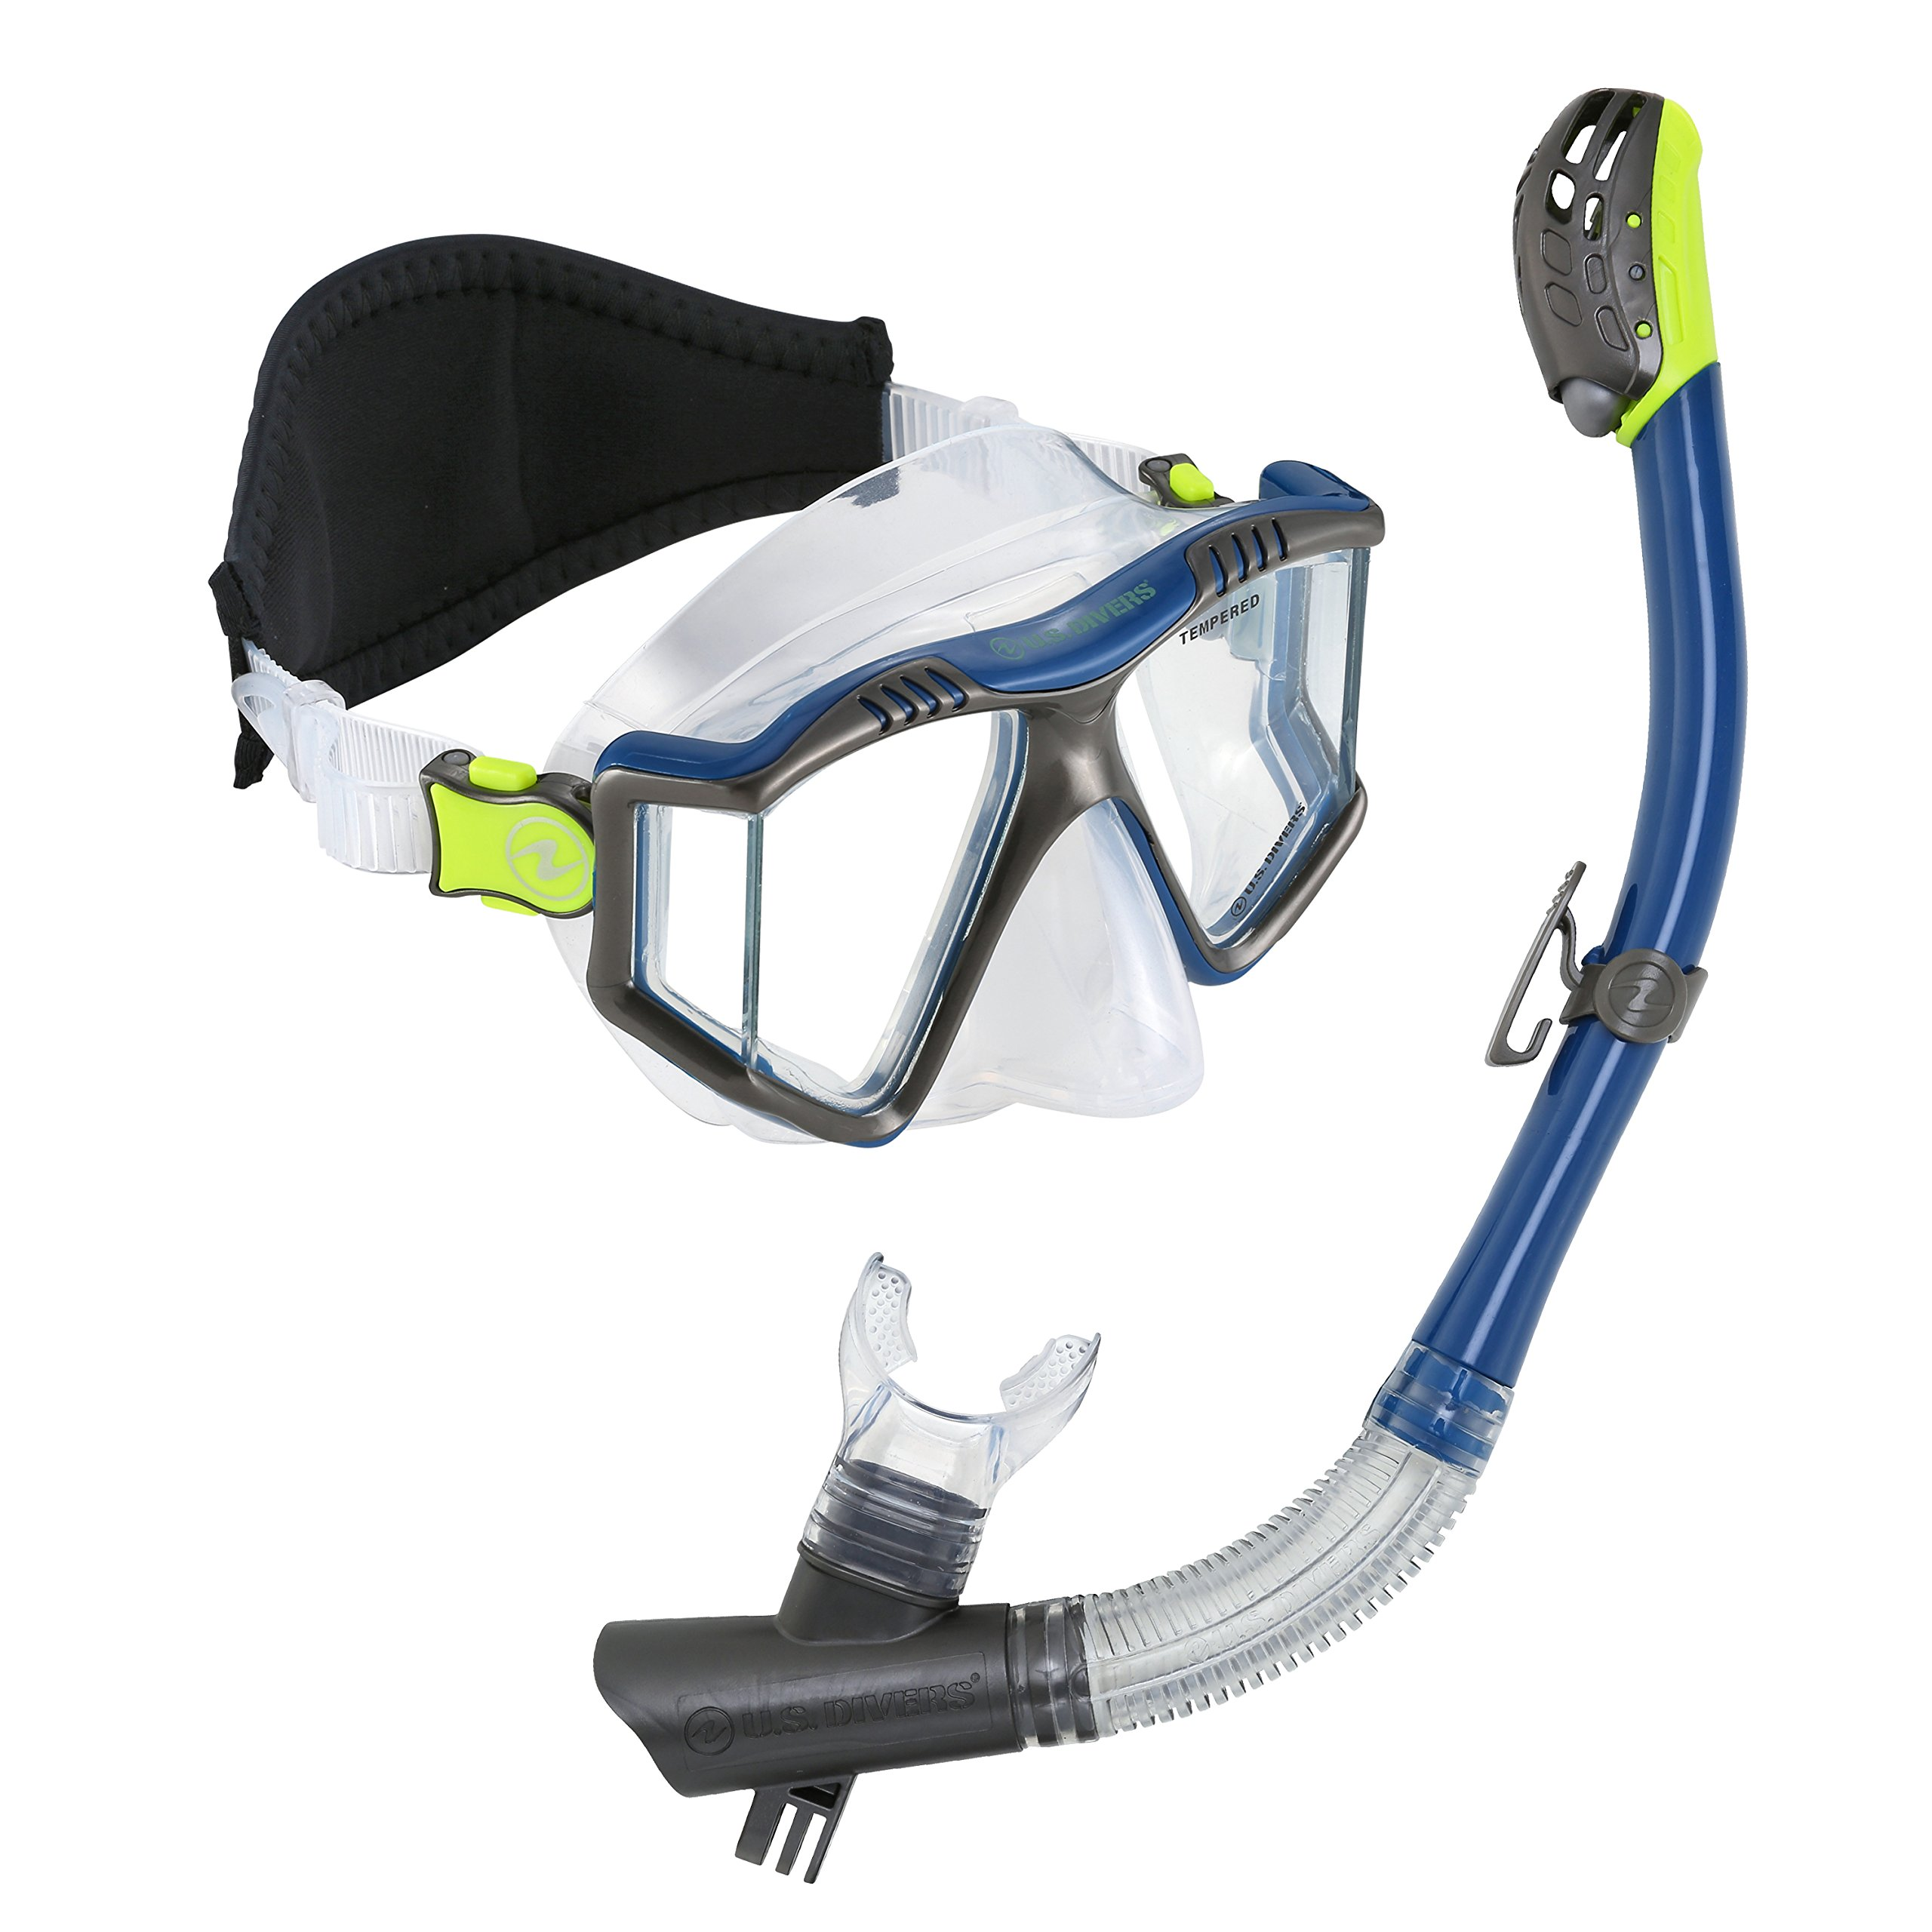 U.S. Divers Lux Purge Mask Phoenix Go Pro Snorkel Combo, Dark Matter by U.S. Divers